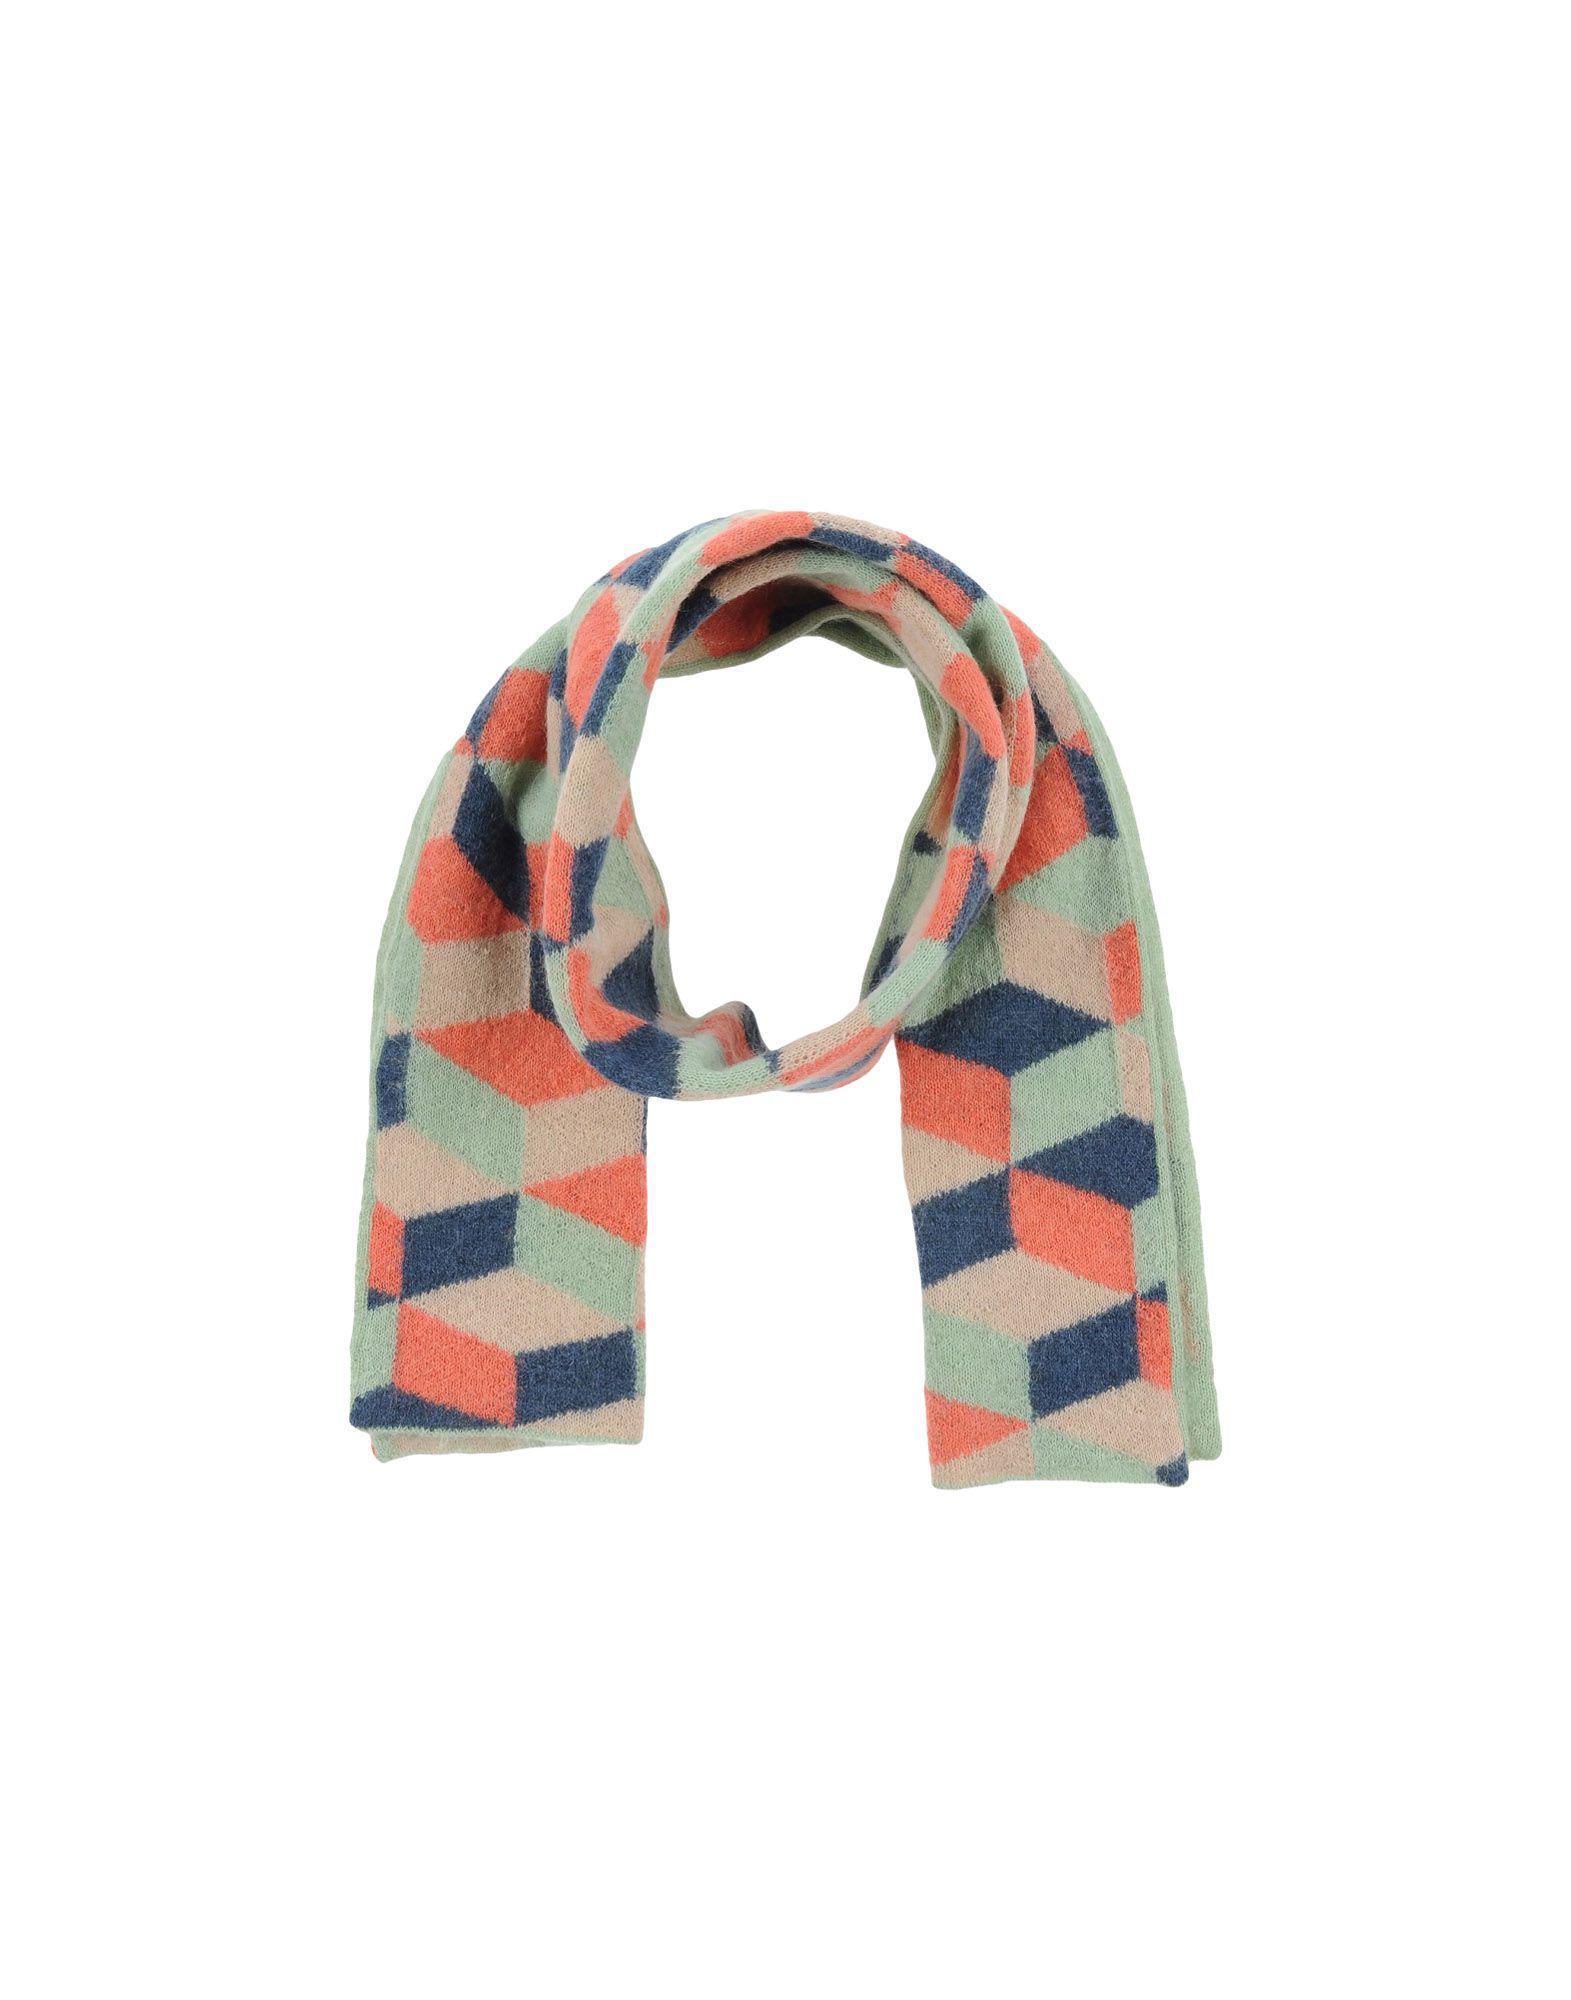 ACCESSORIES - Oblong scarves Loma 6lHYYMRAmz